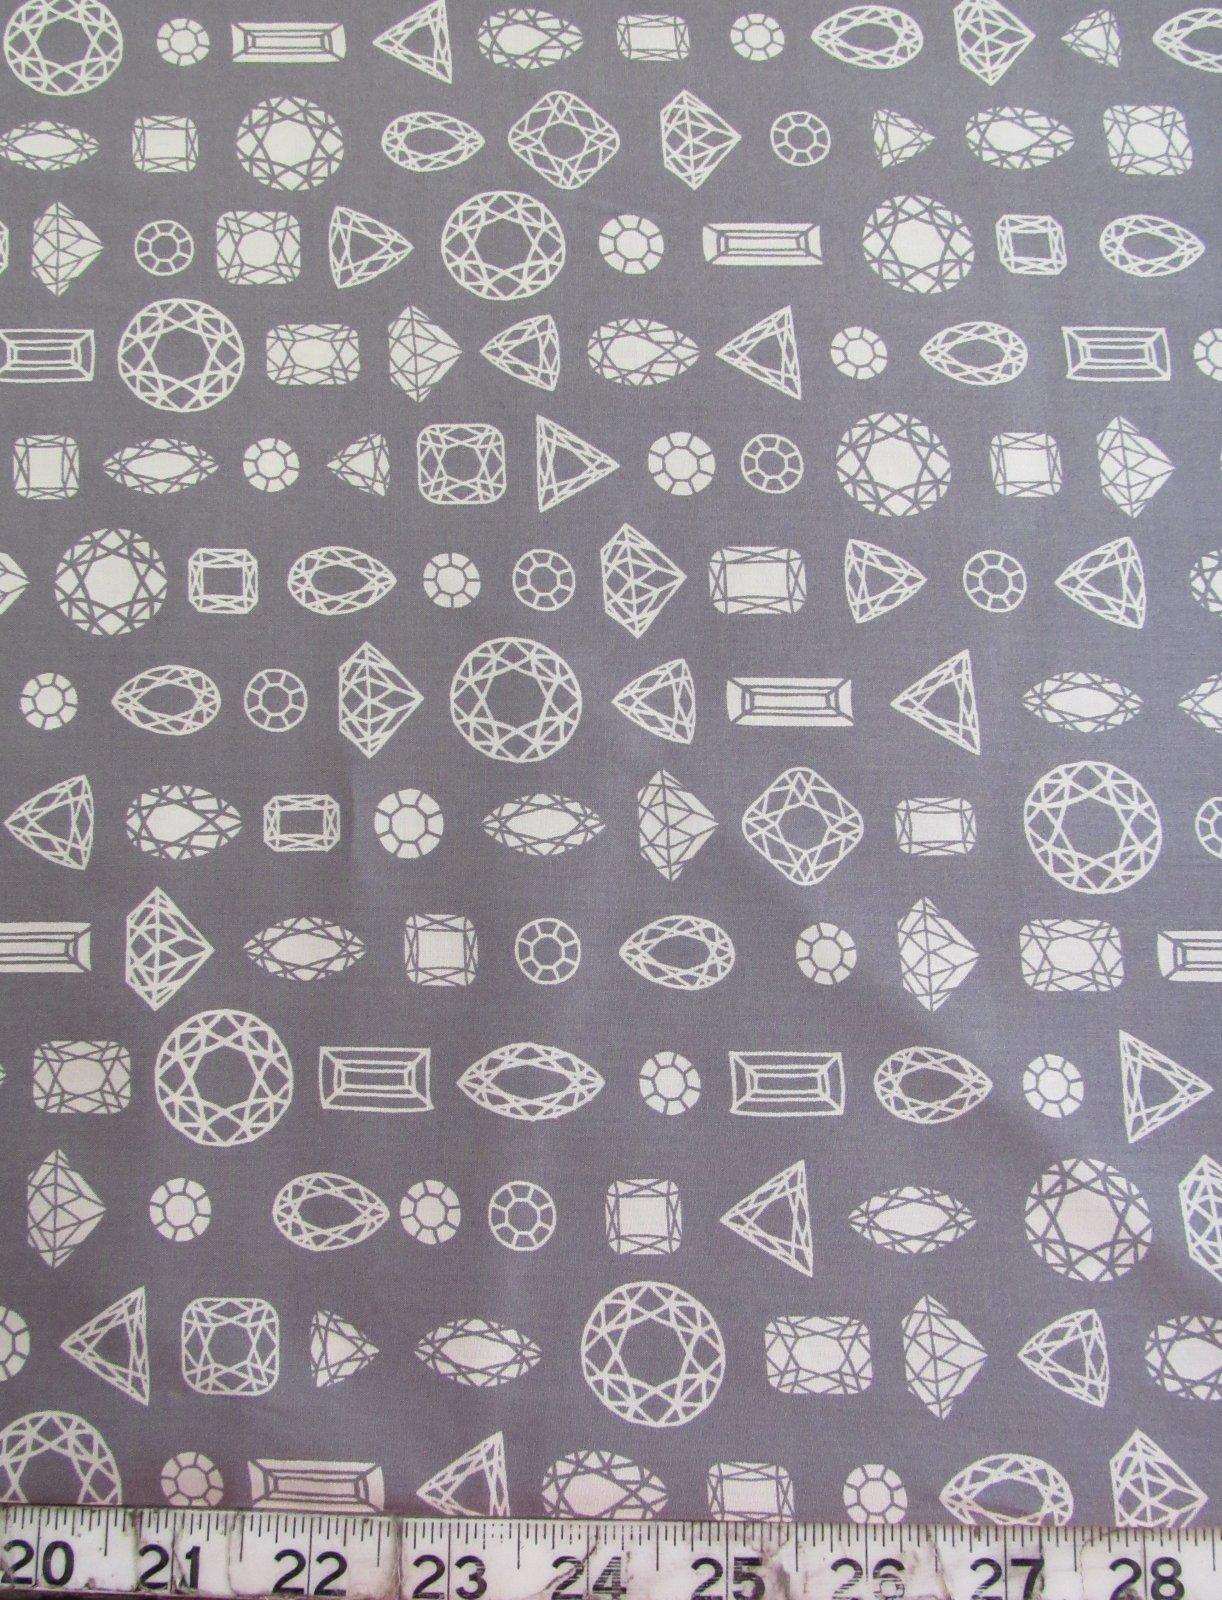 Cotton & Steel COTTON LAWN Moonlit Gems Grey by Rashida Coleman-Hale